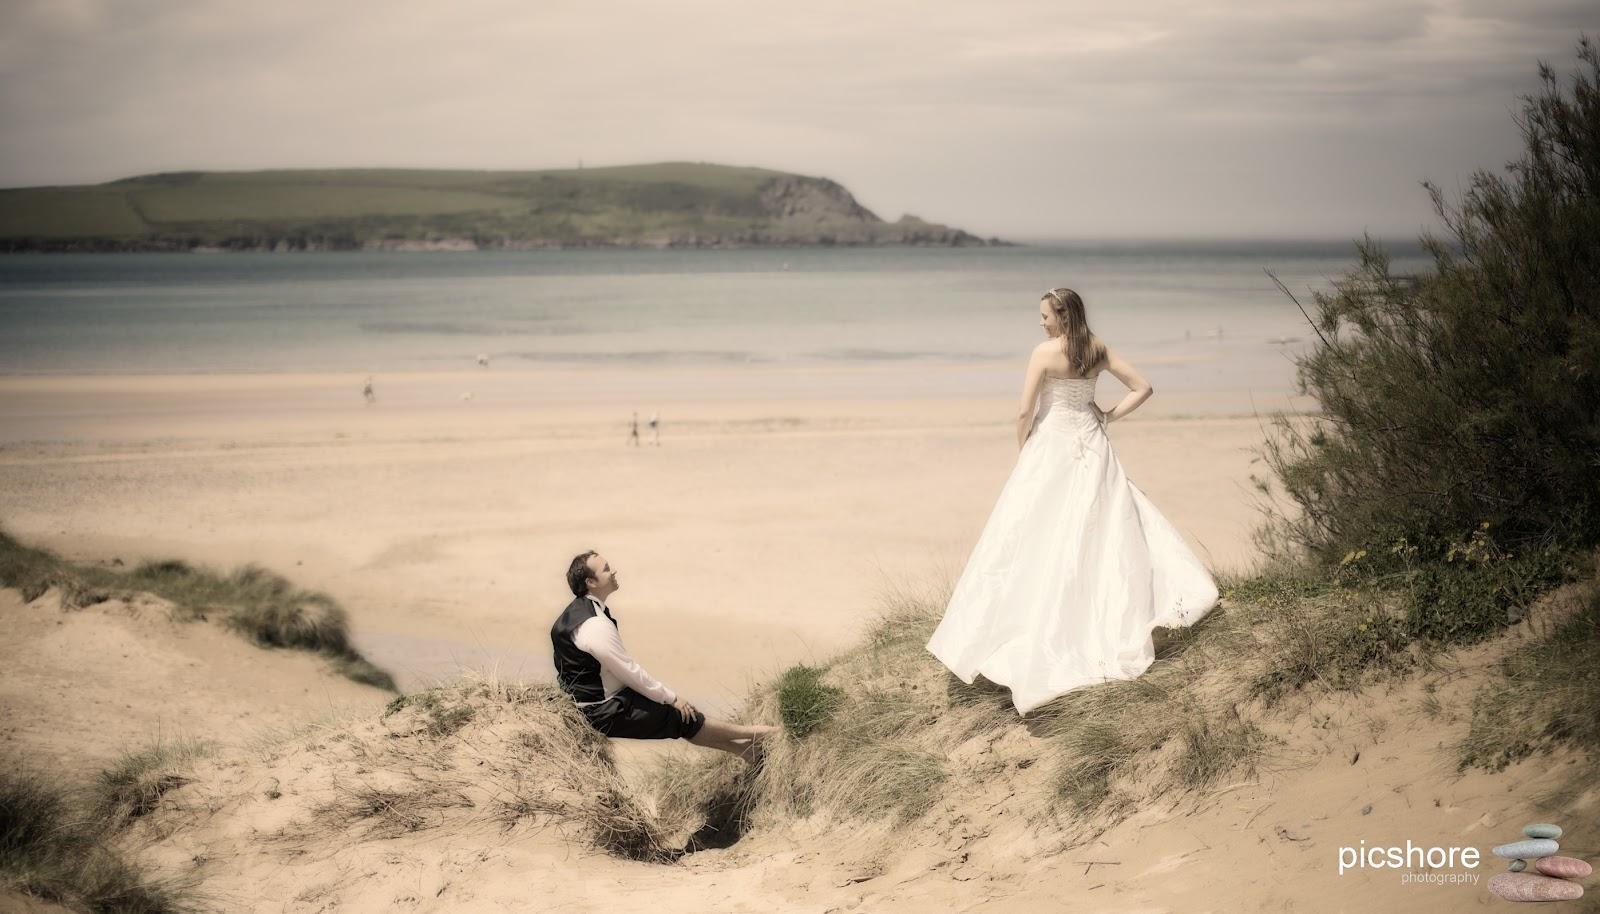 Daymer+Bay+Cornwall+beach+wedding+Picshore+Photography+8 - wedding venues cornwall beach